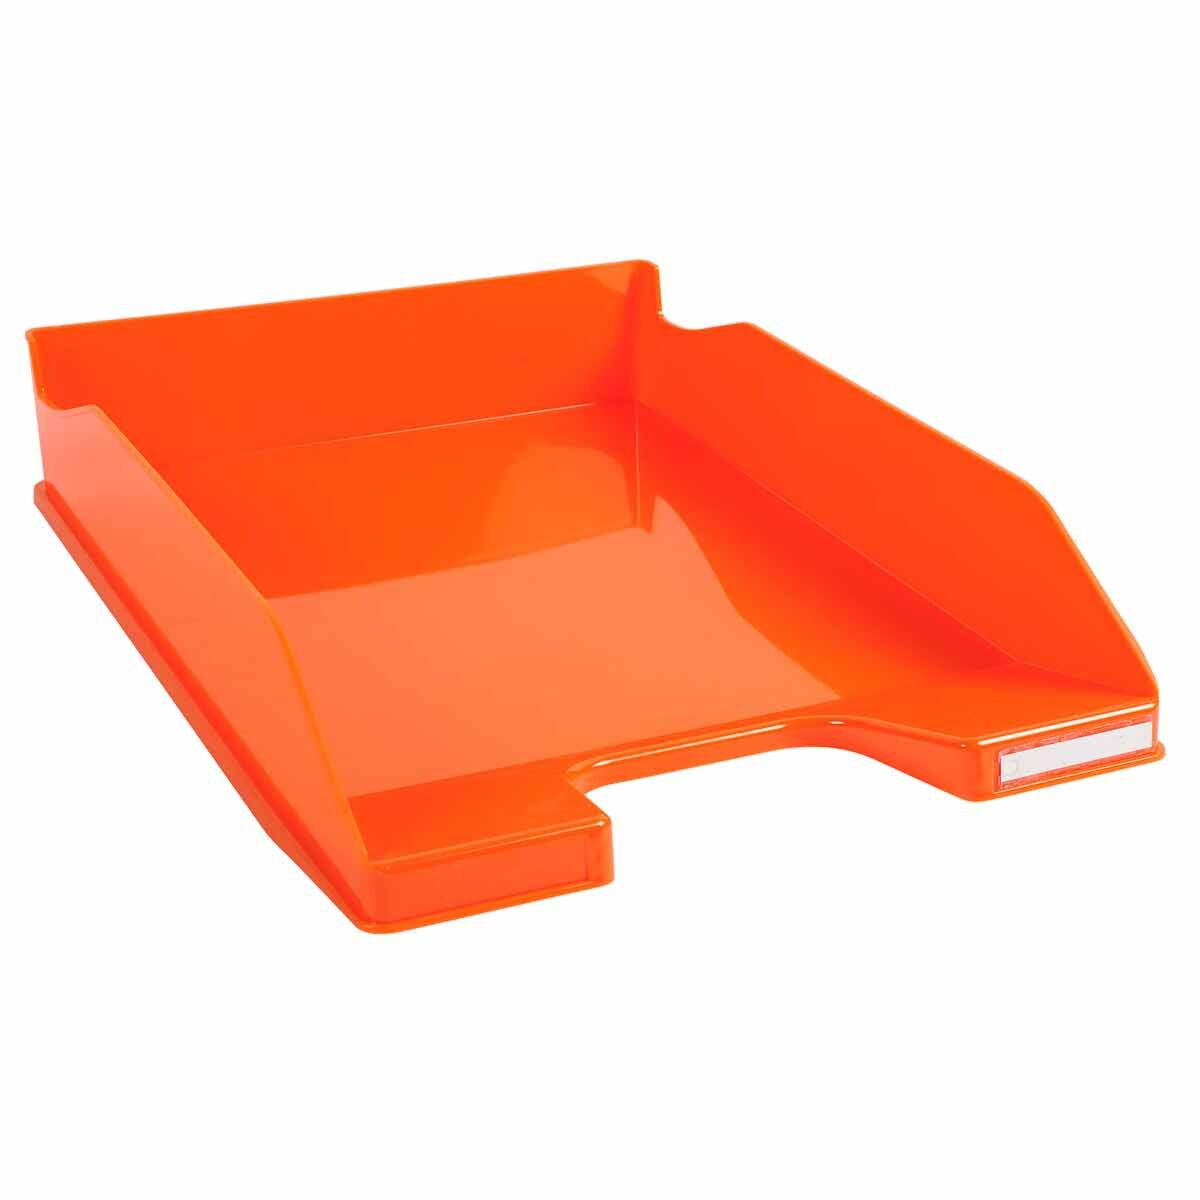 Exacompta Office Letter Tray Midi Combo Pack of 6 Gloss Orange